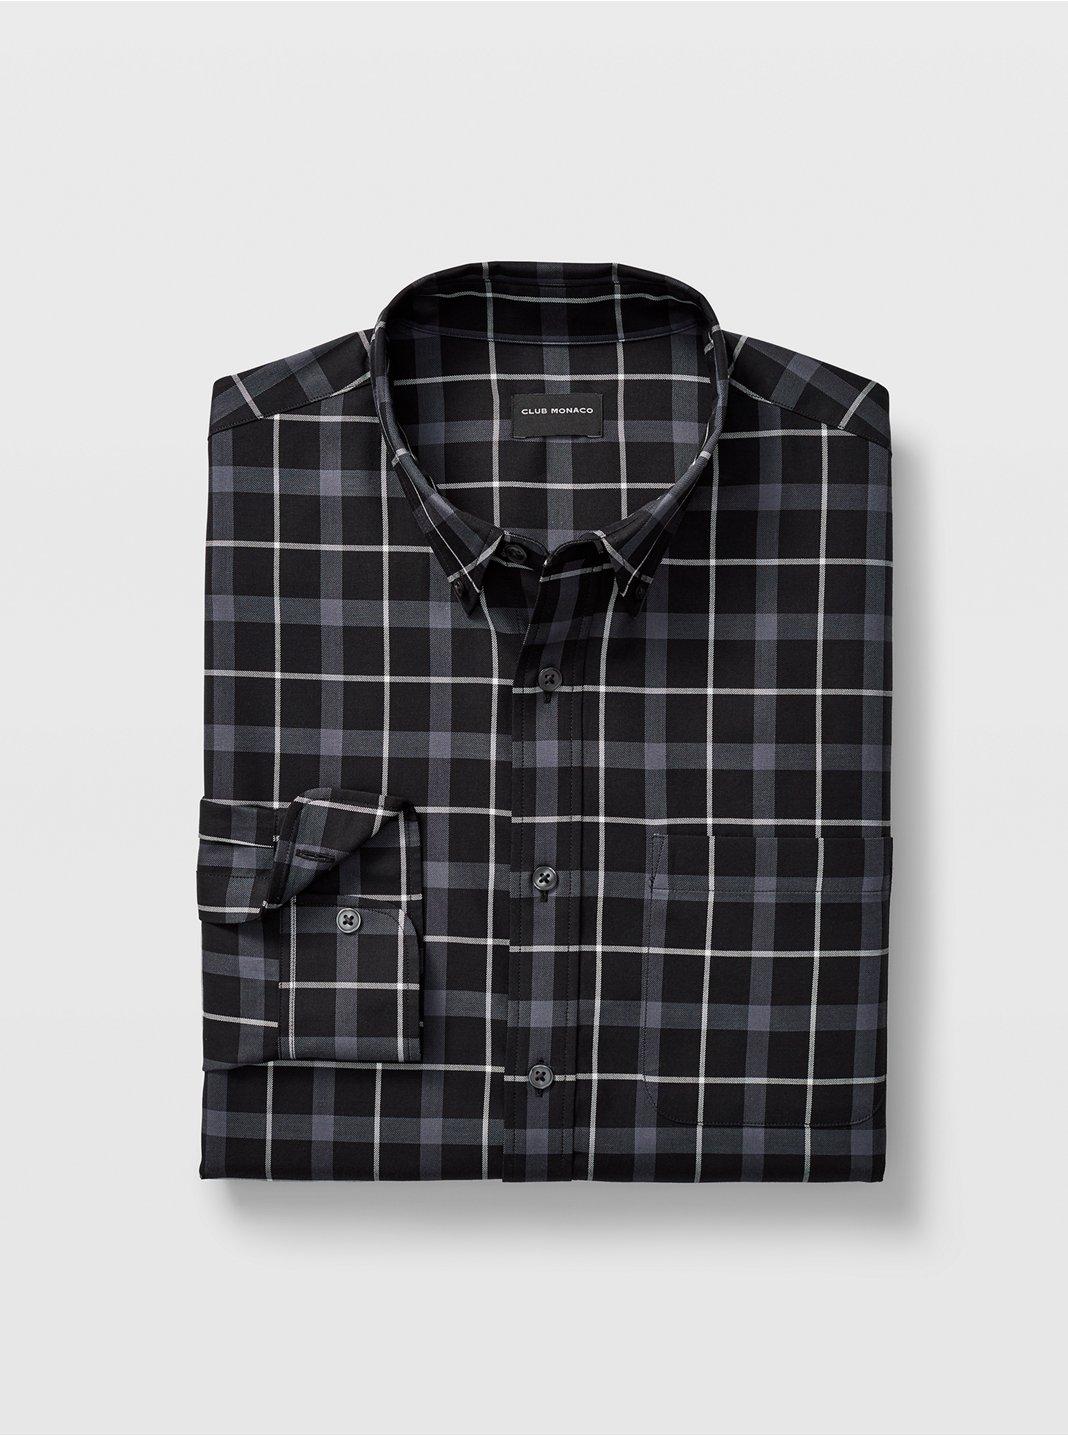 Slim Noveau Check Shirt